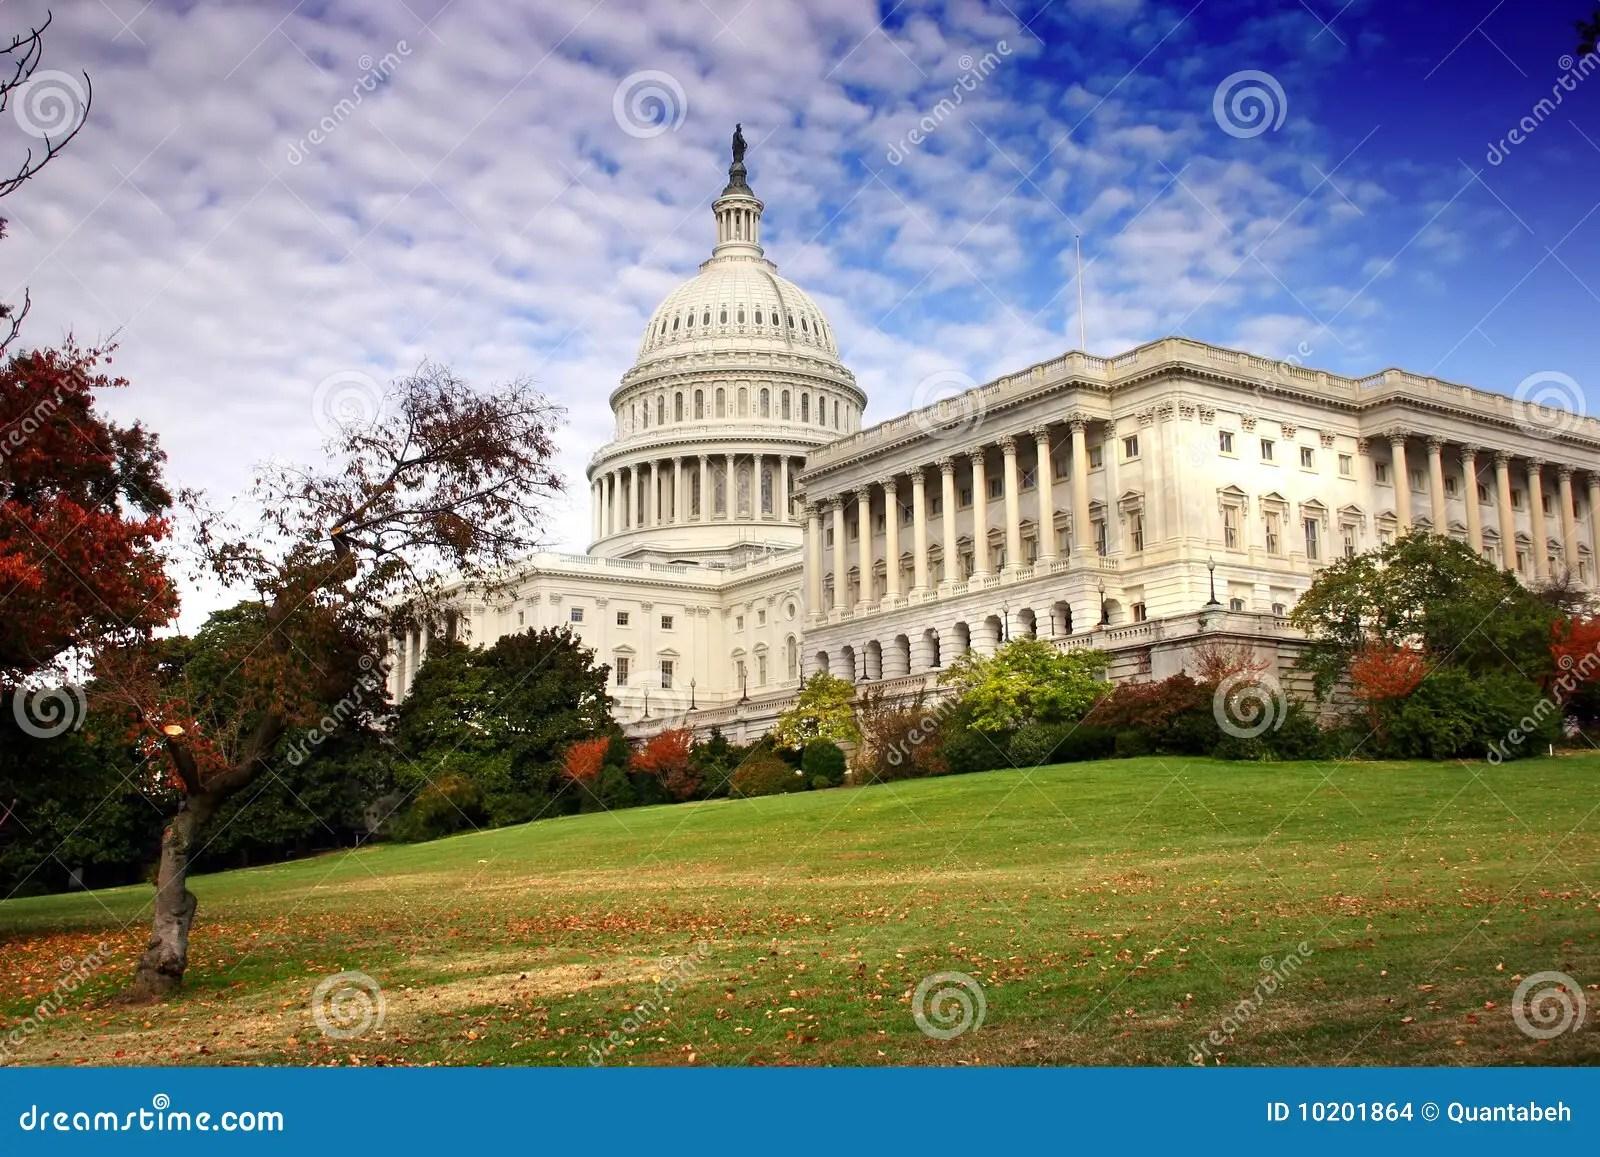 The United States Congress Stock Photo Image Of